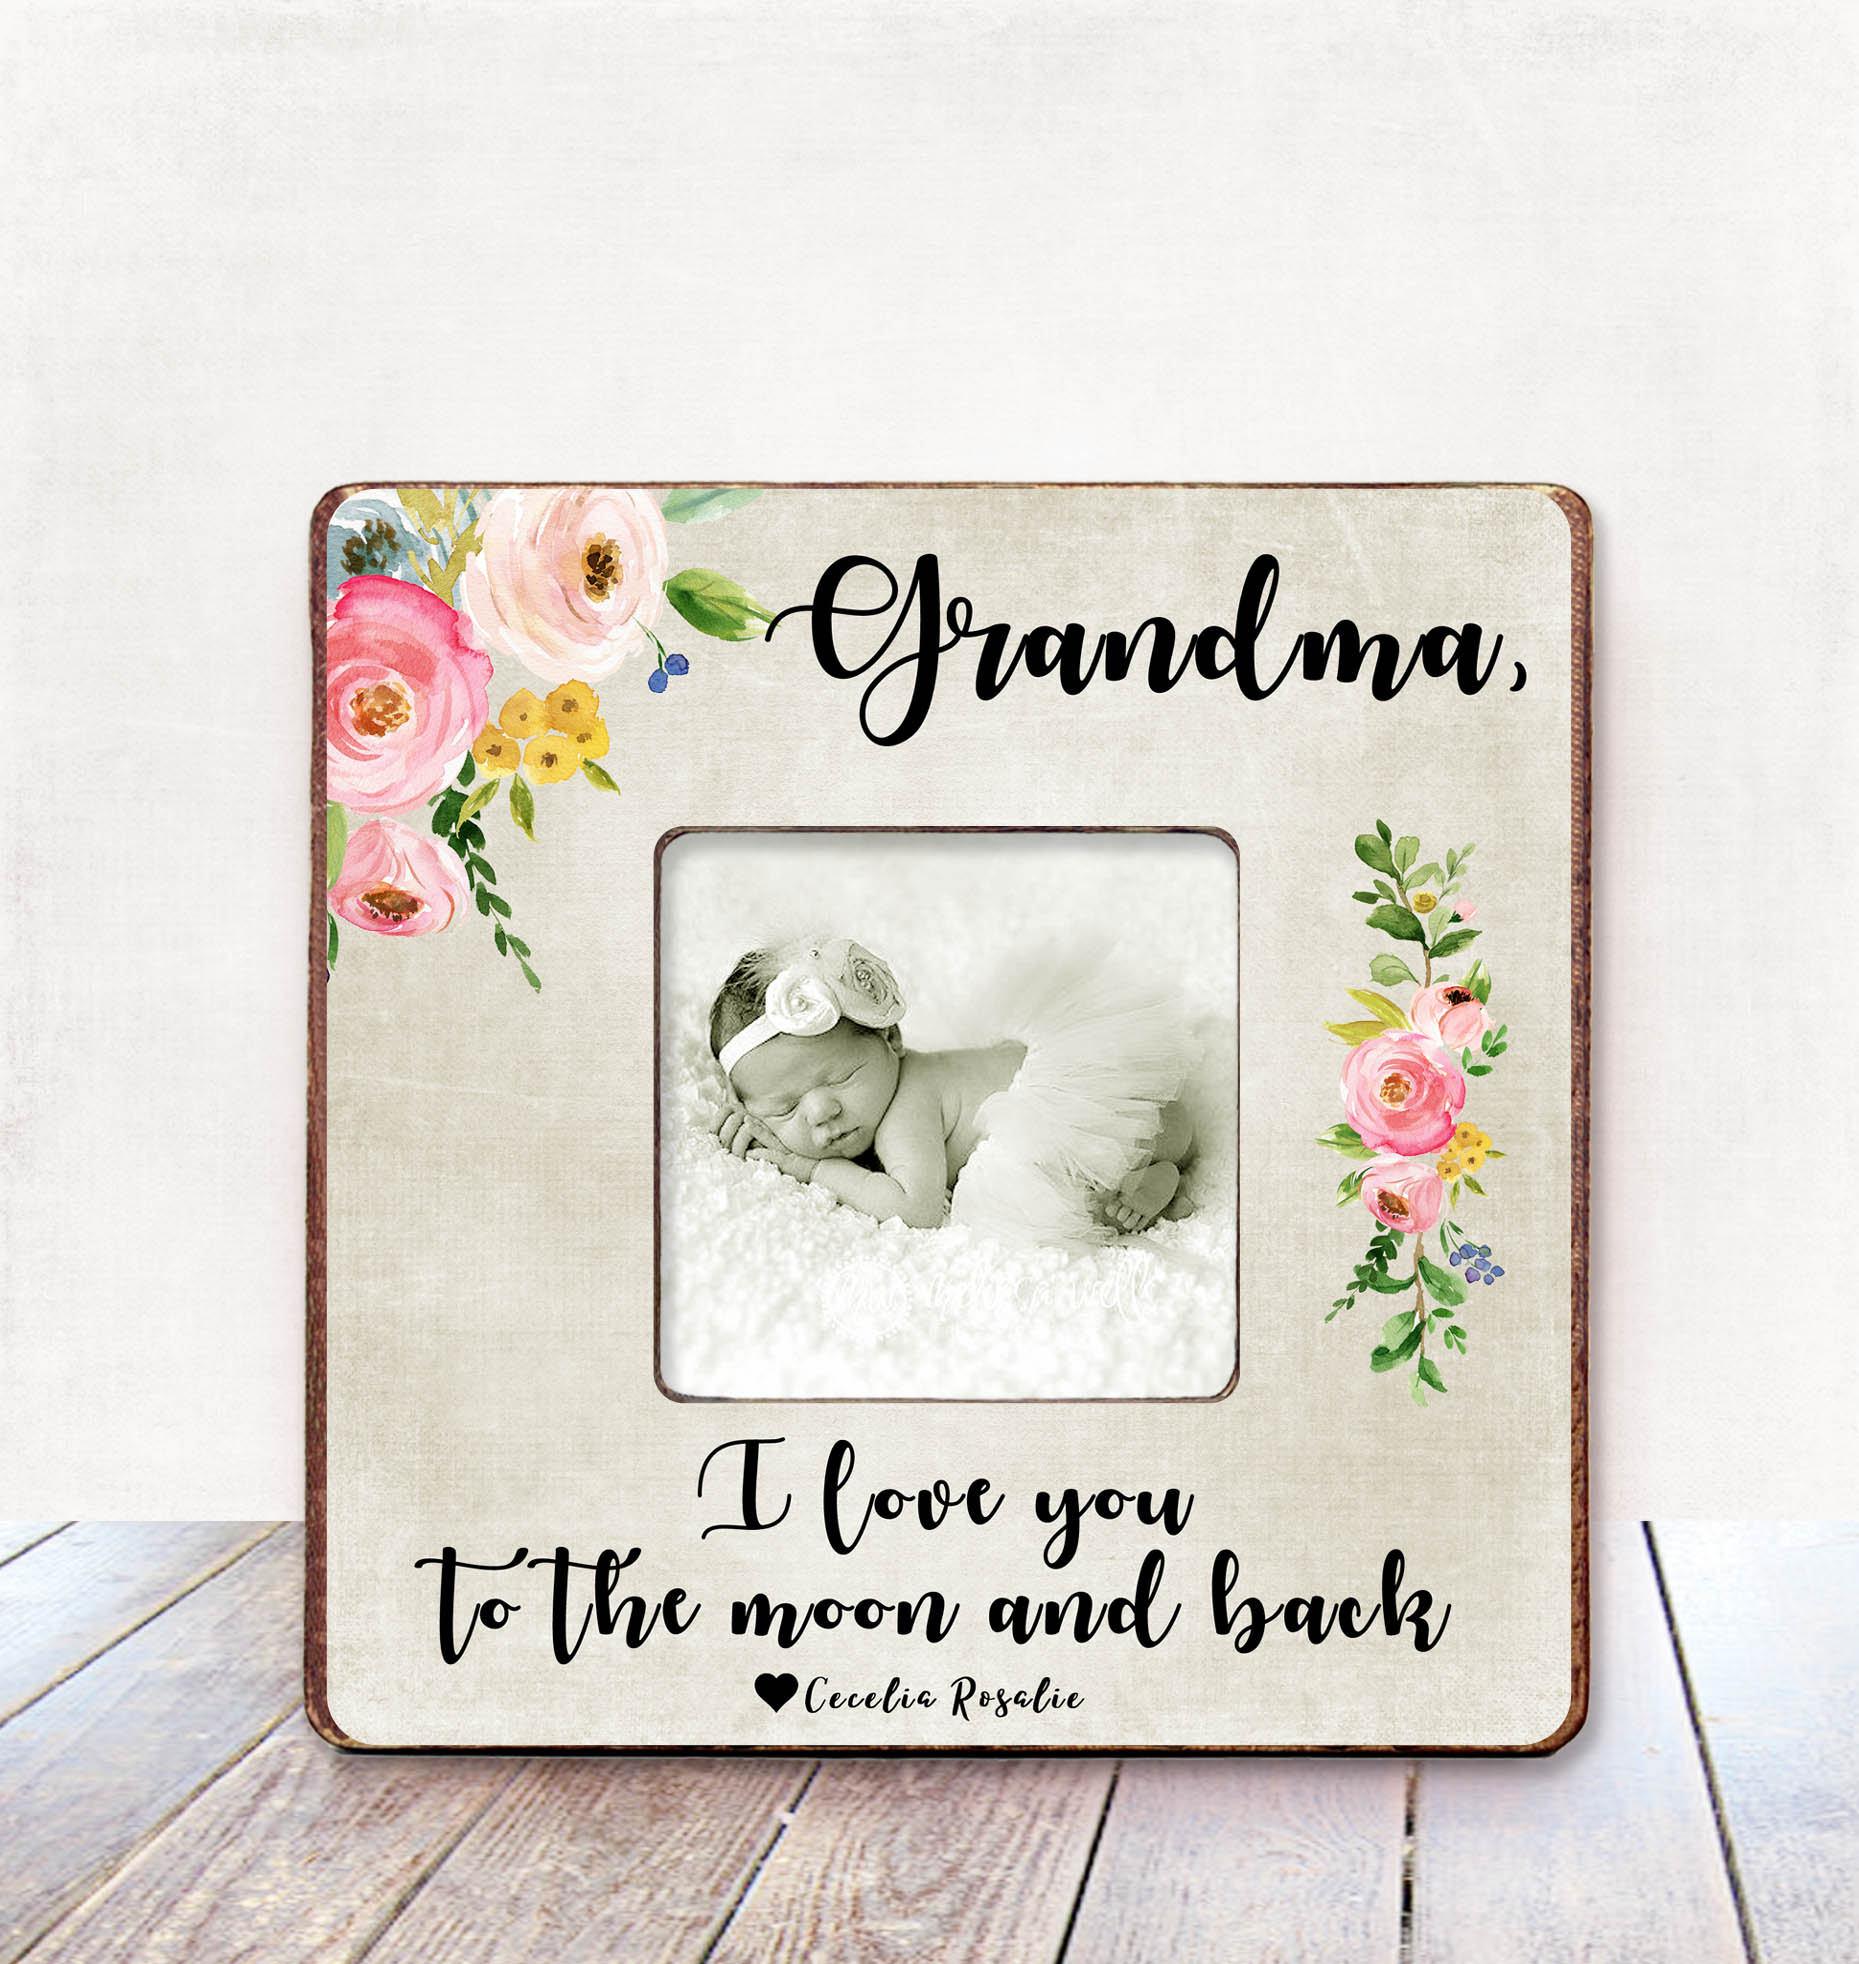 Oma Geschenk Nana Geschenk Großmutter Geschenk Oma Geburtstag | Etsy